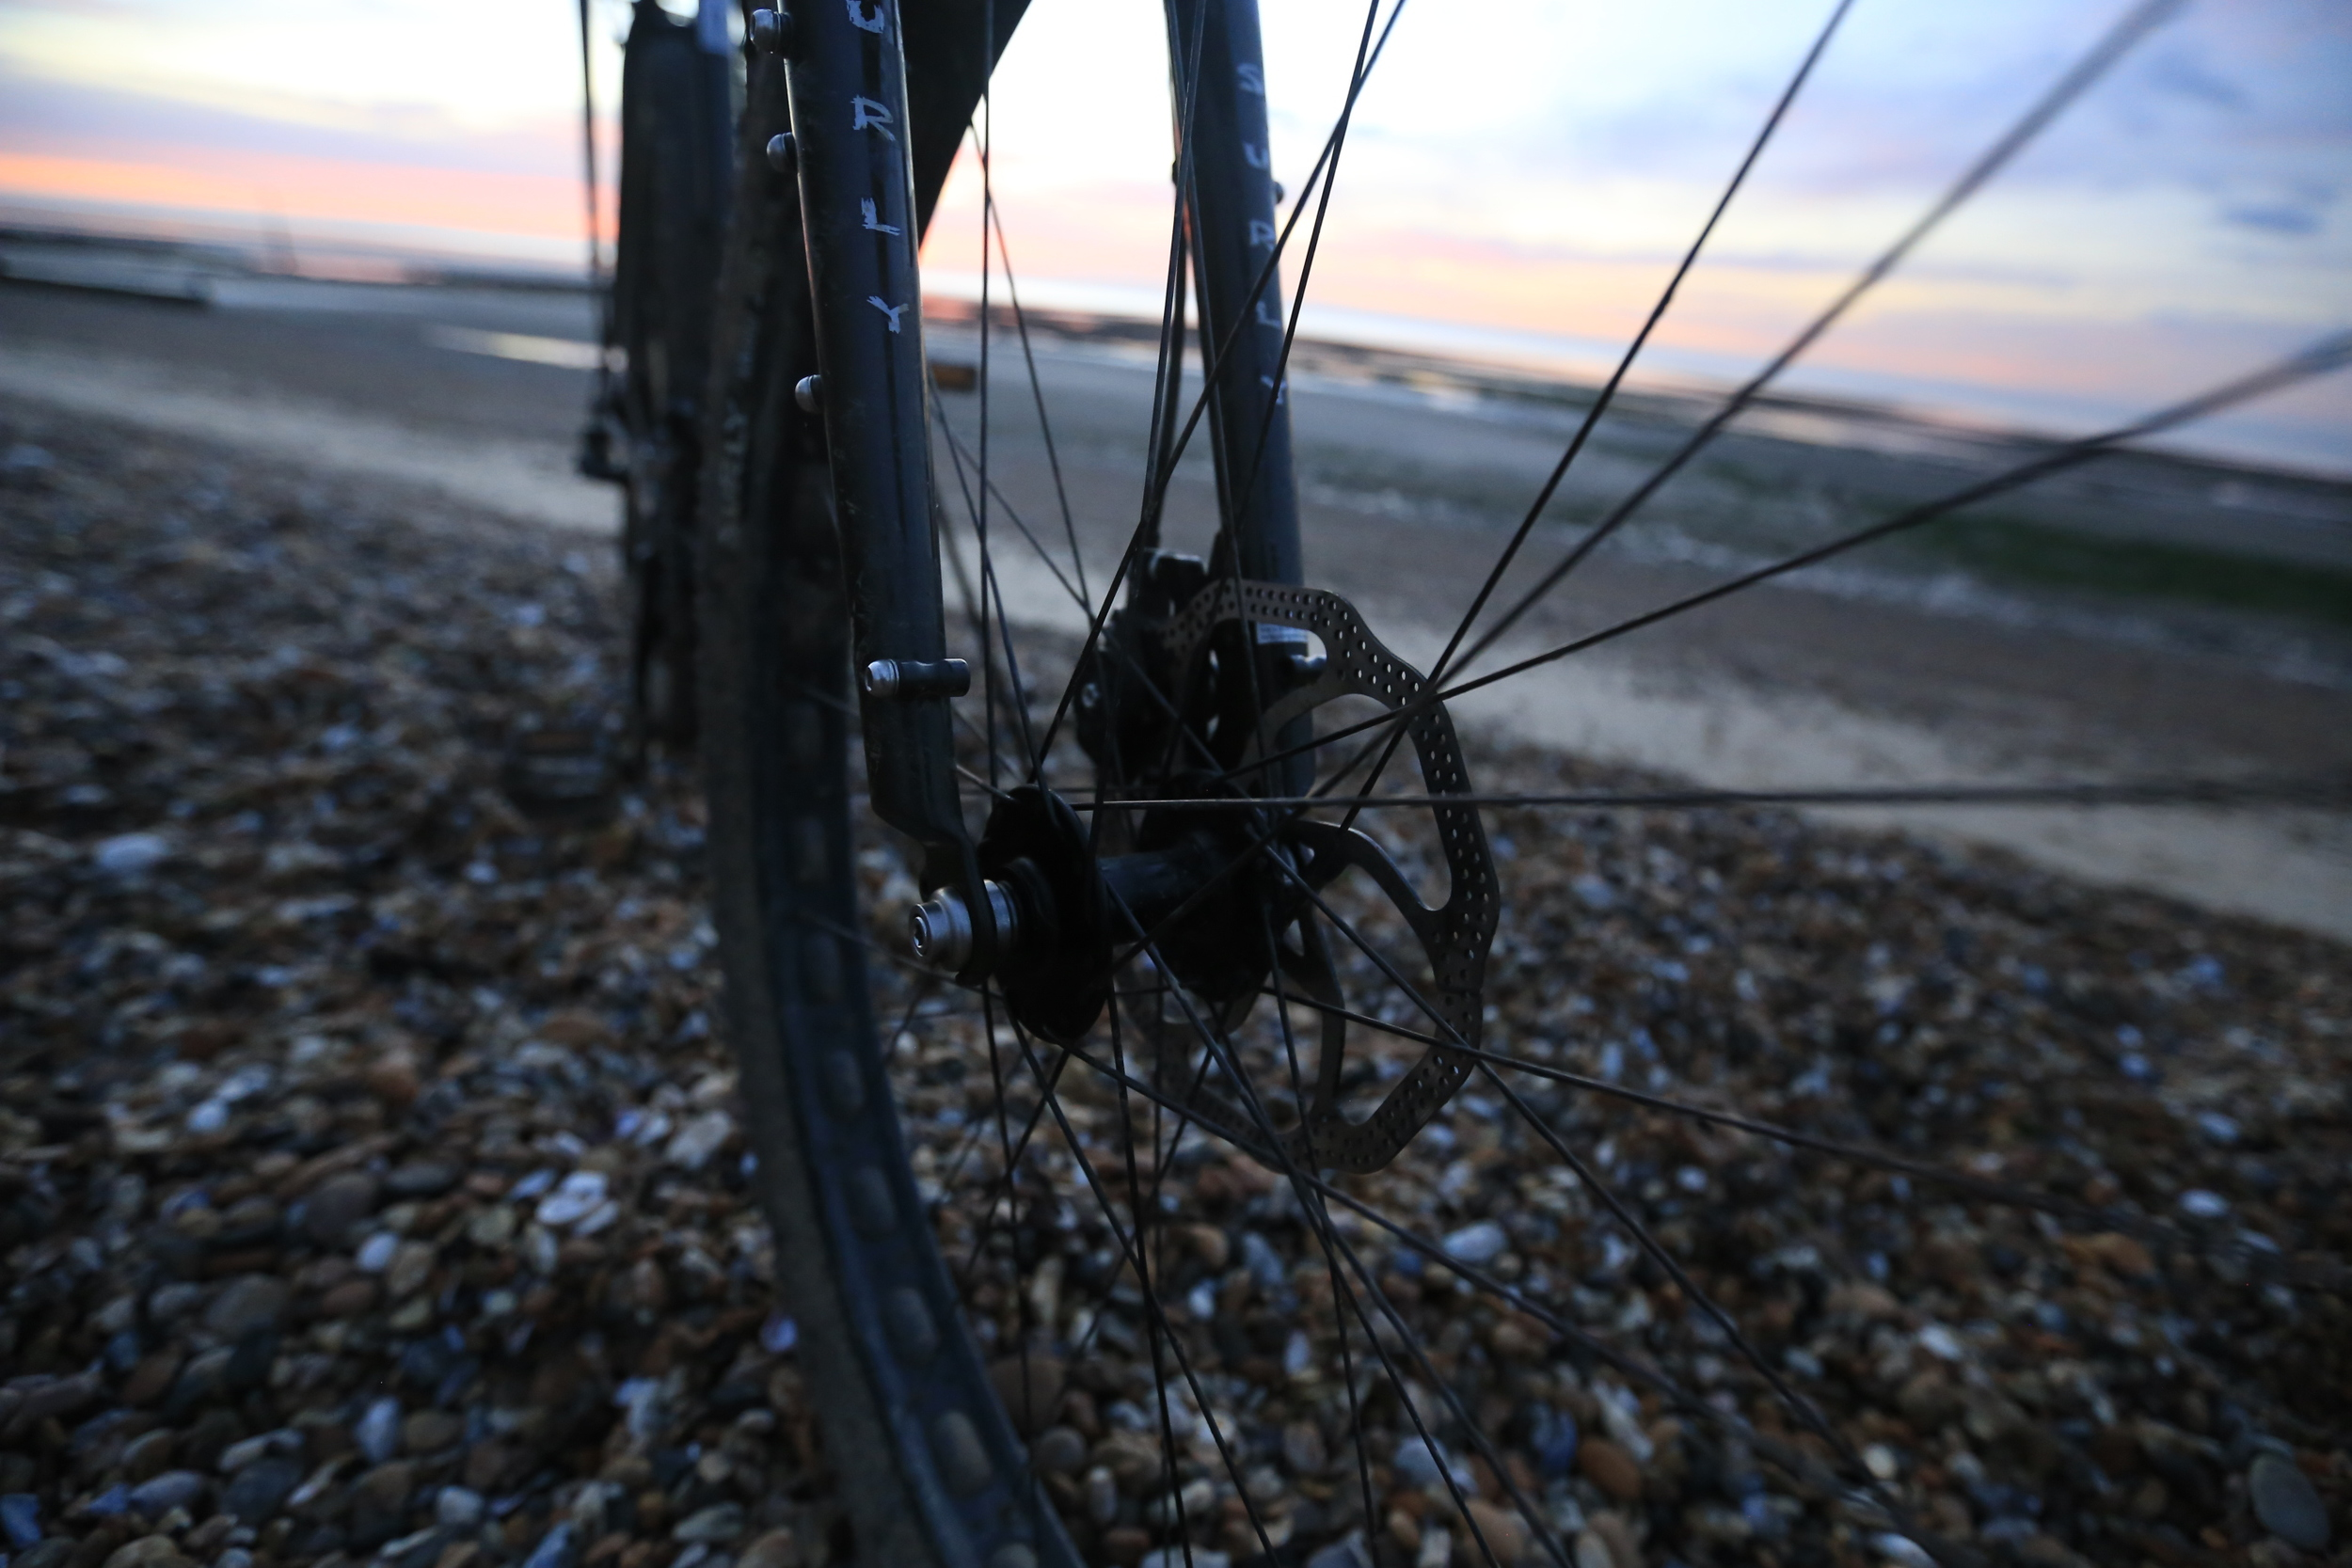 disc brakes, ecr, surly ecr, rabbit hole rims, bicycle touring apocalypse, knards, beach, cycling blog, bicycle, bikepacking blog, bikepacking